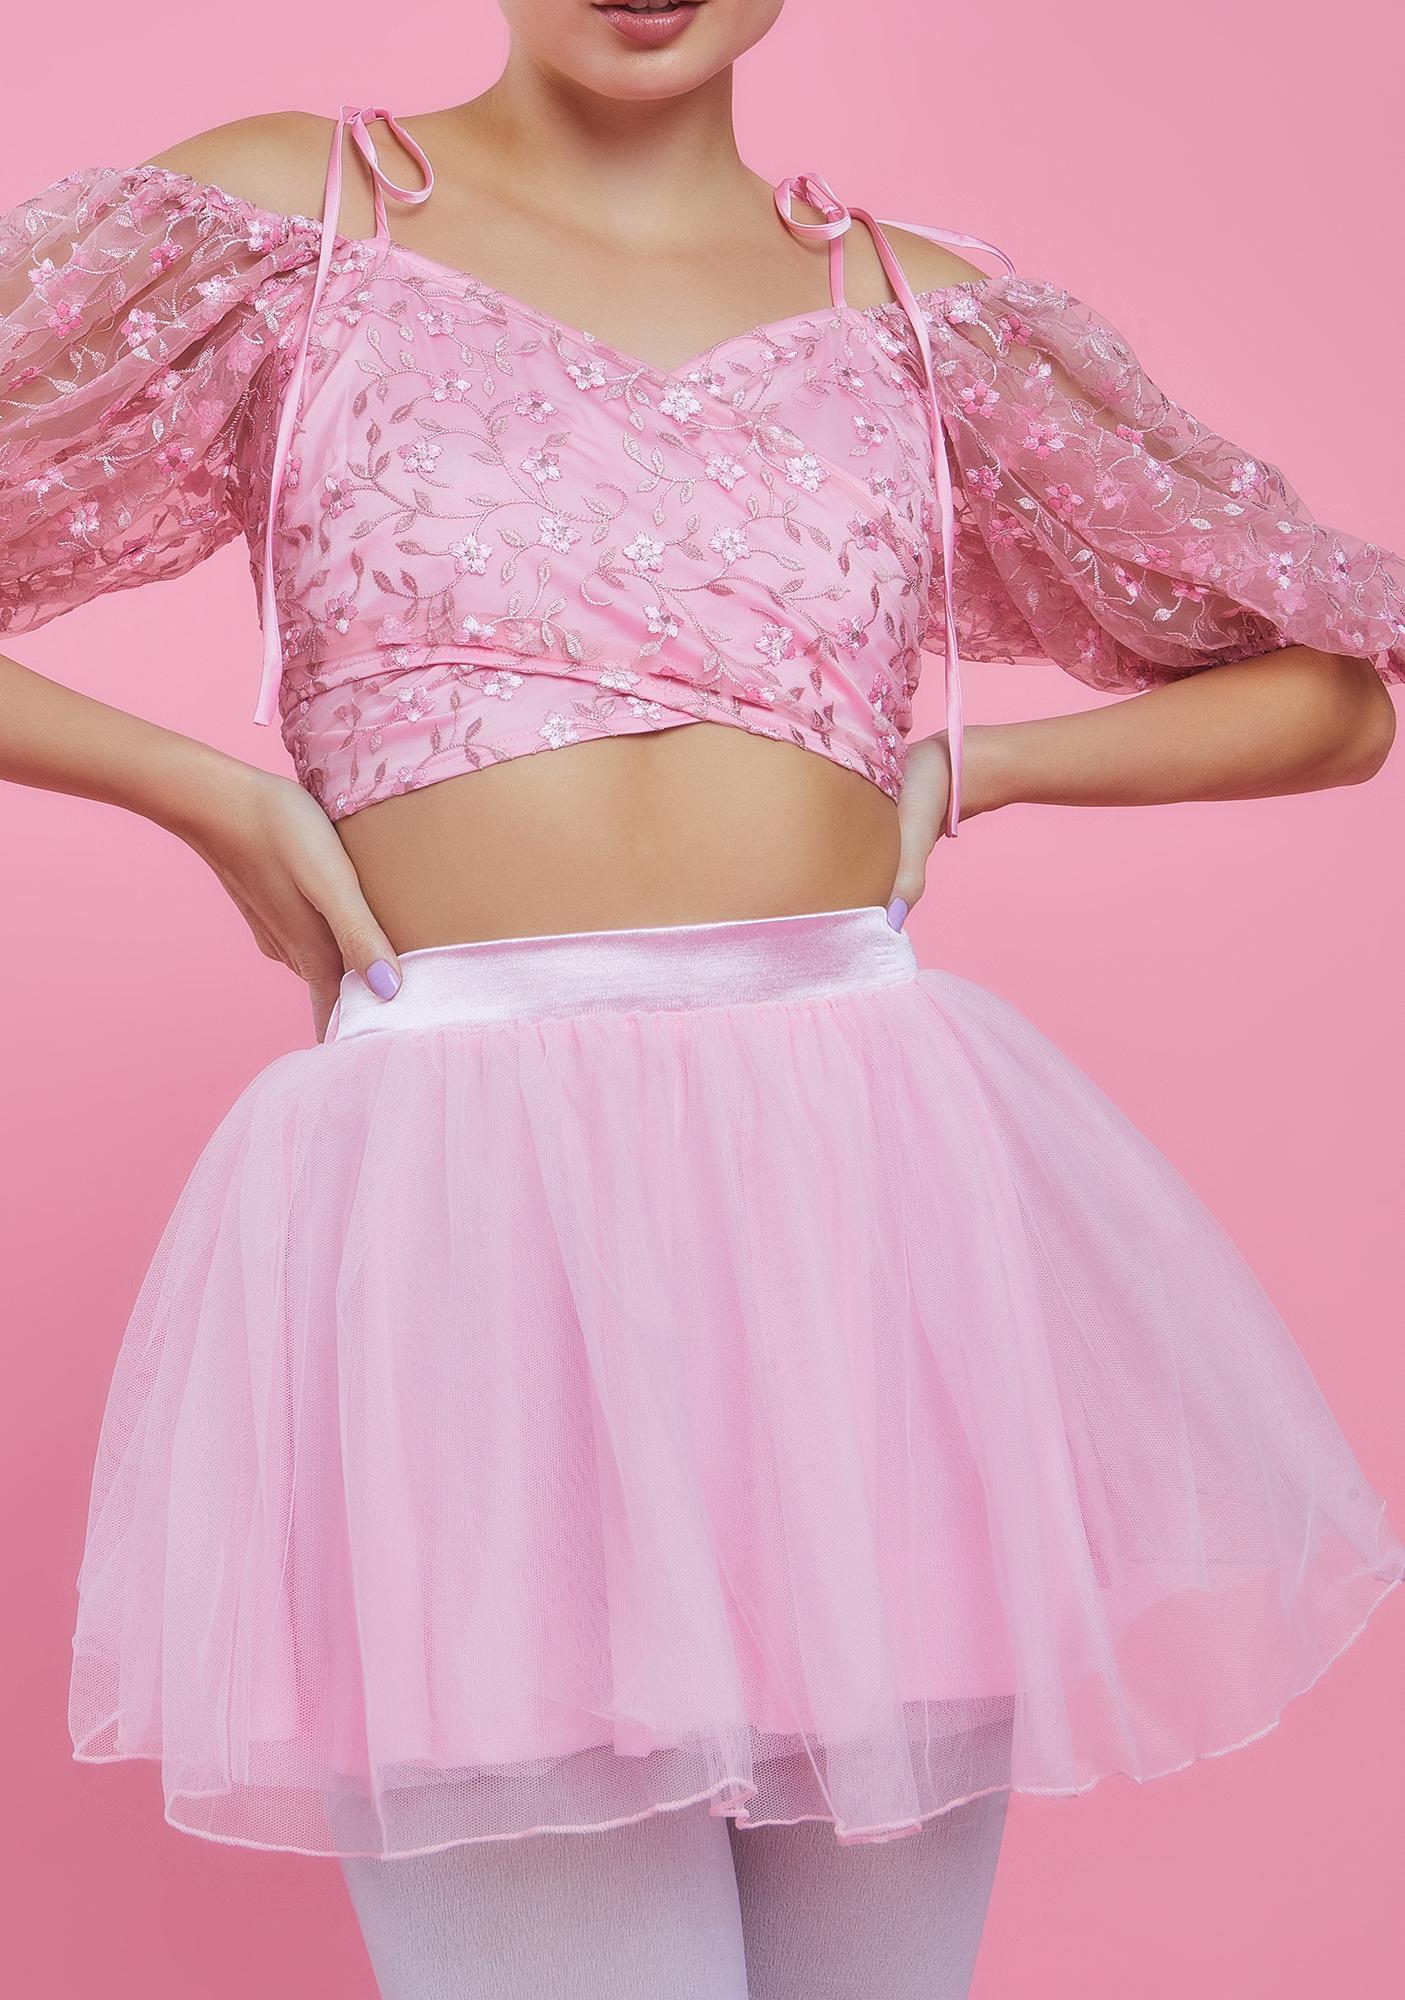 Sugar Thrillz Got Your Attention Tulle Skirt